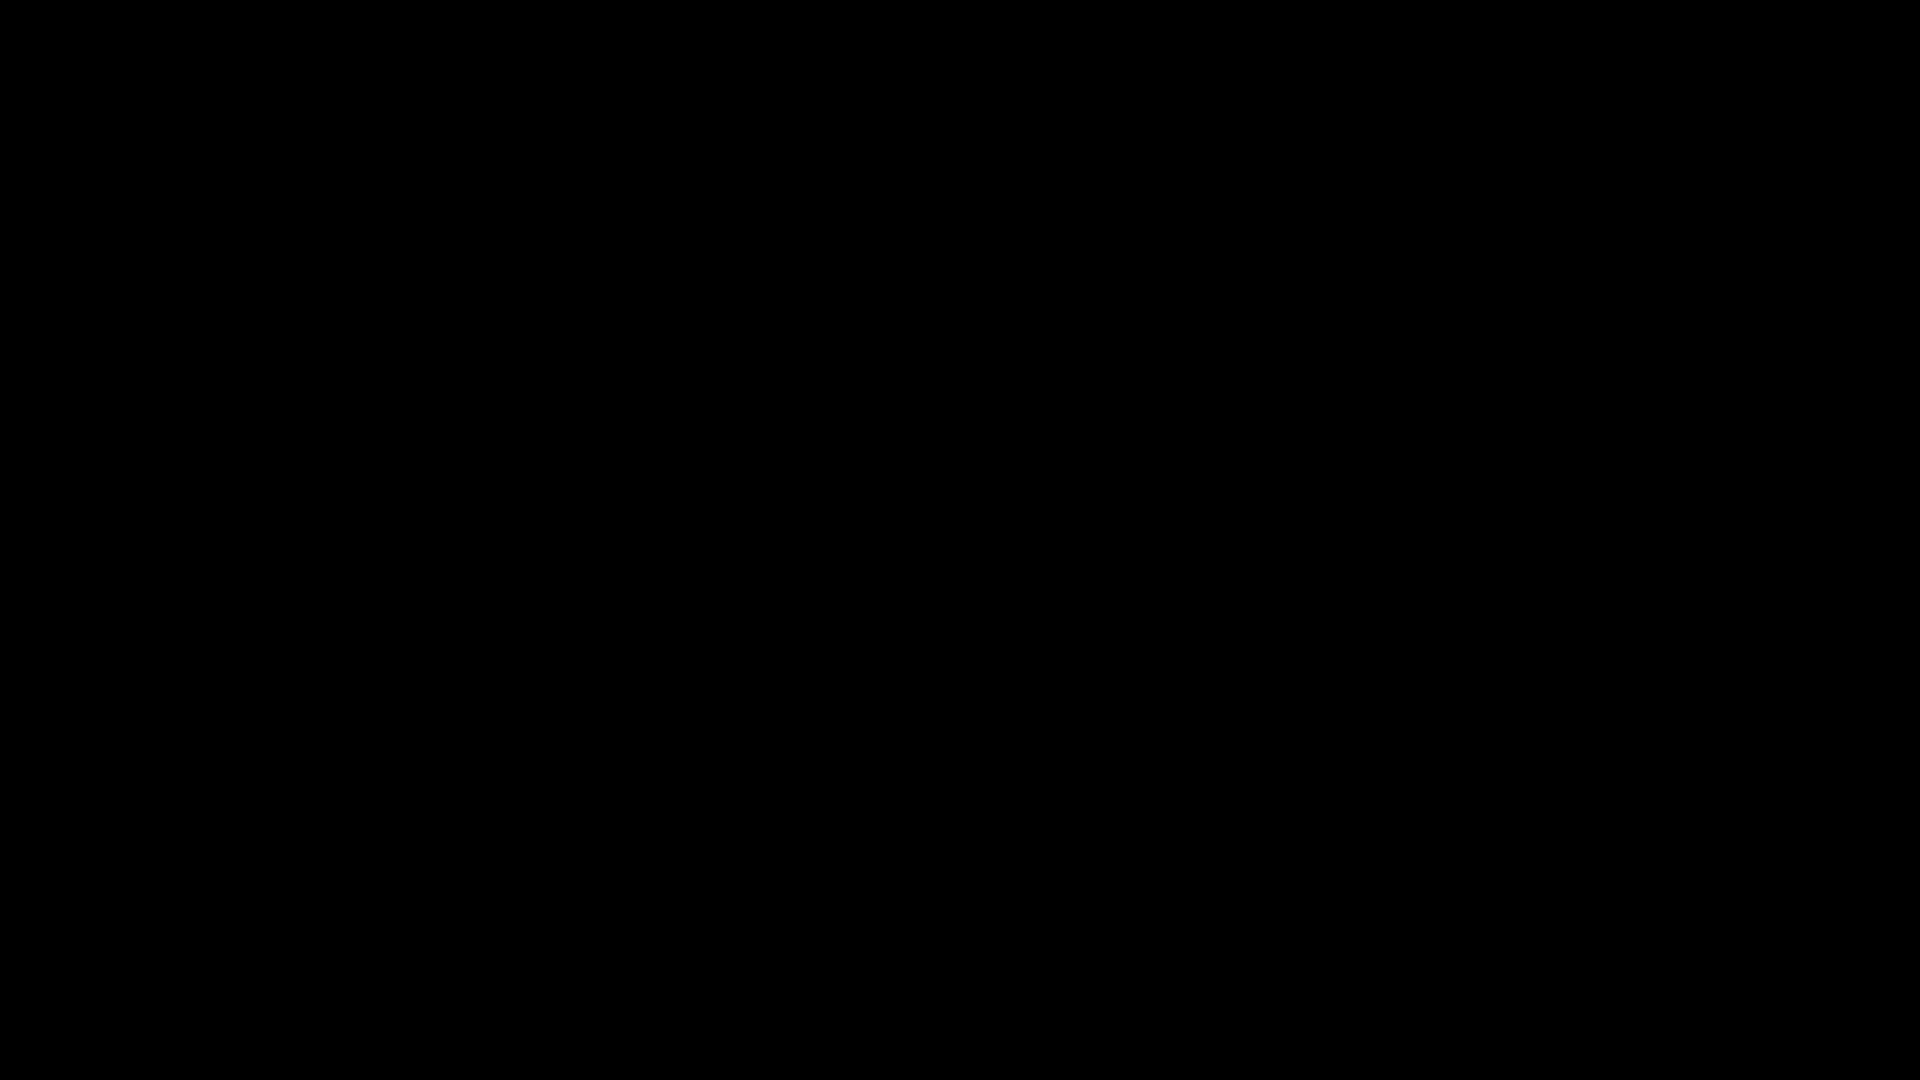 Black image.